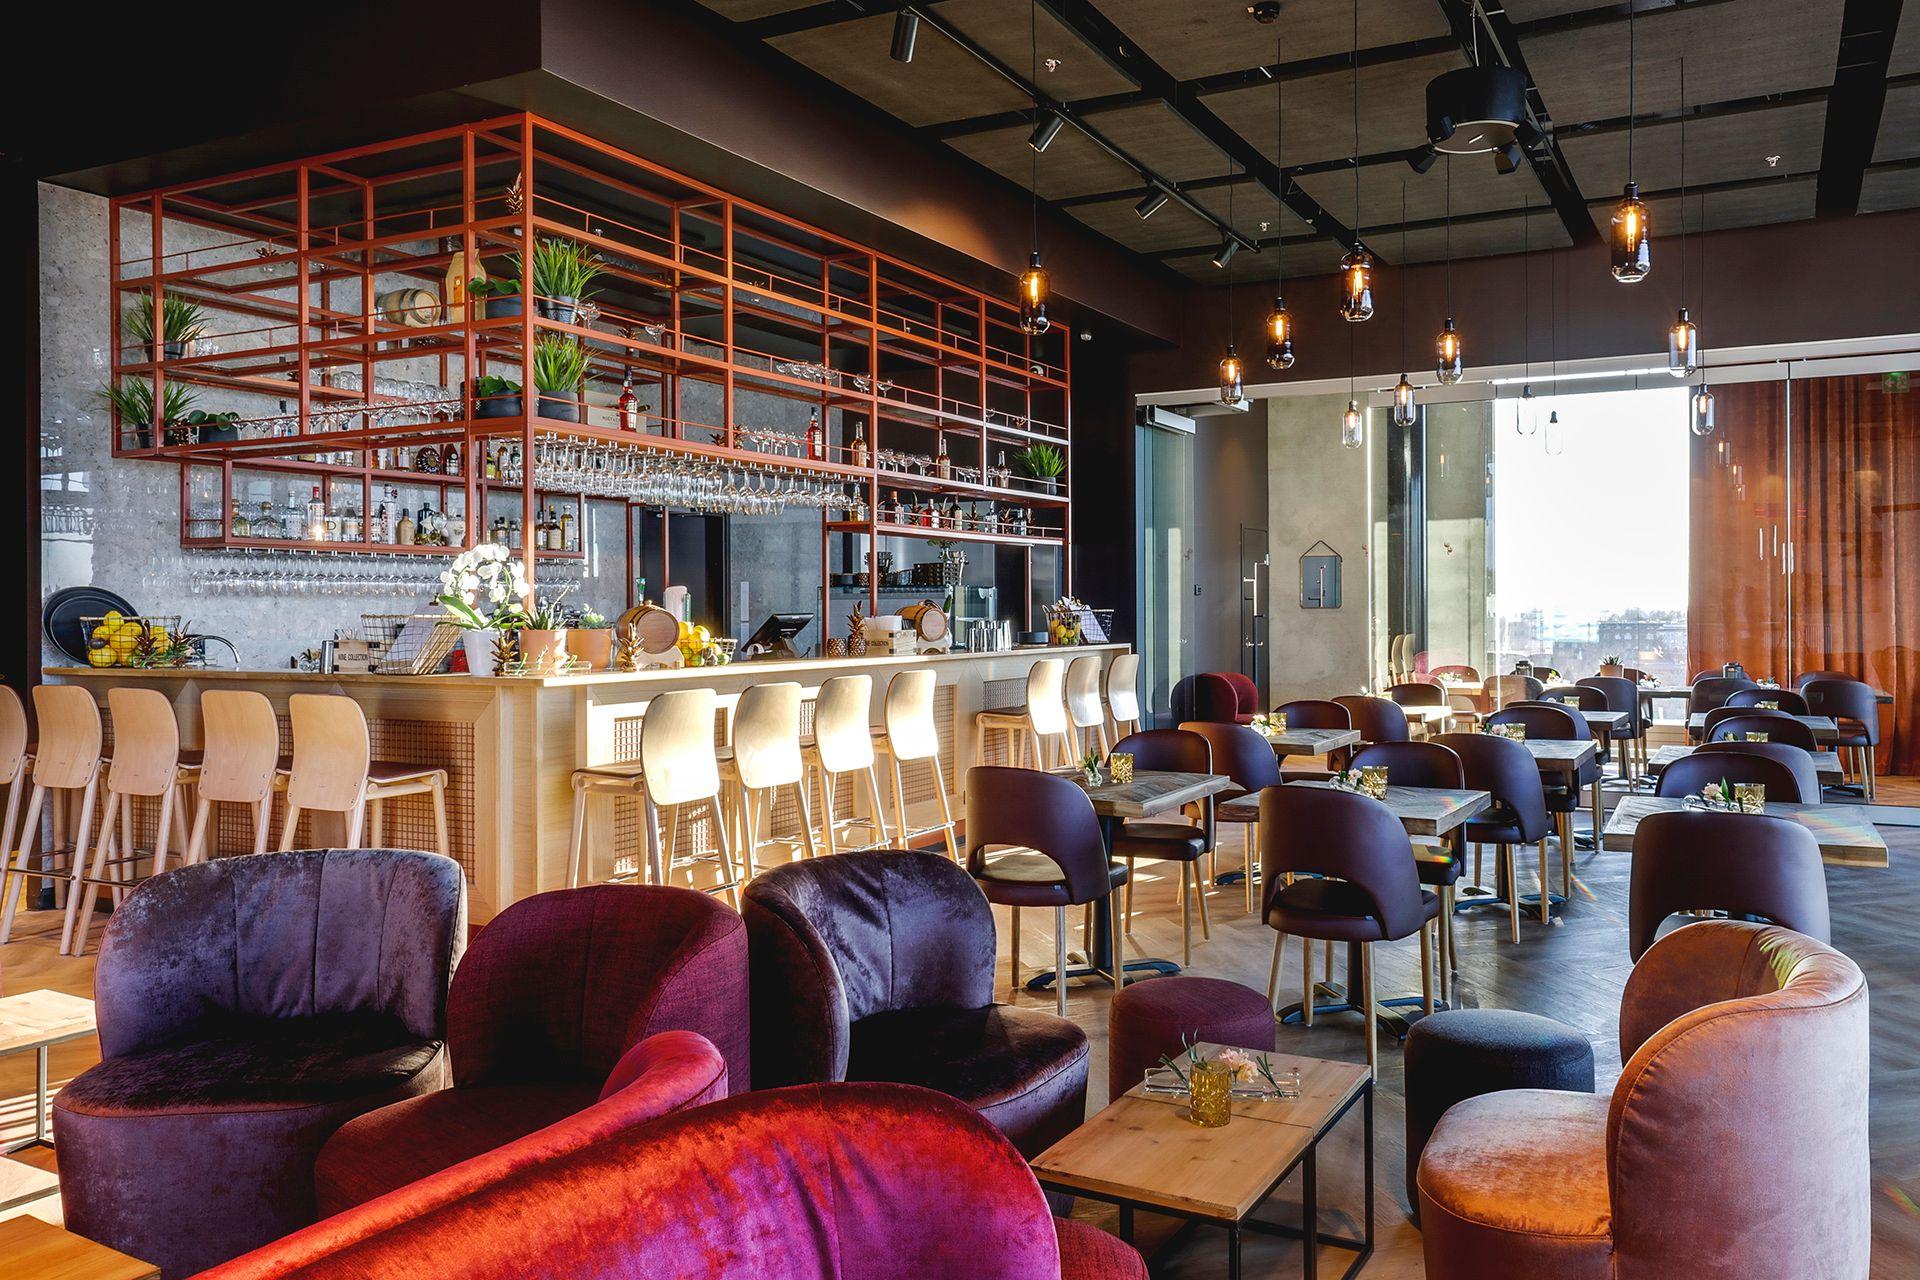 Ravintola Periscope / Lounge Bar - tila virkistyspäivään / Venuu.fi